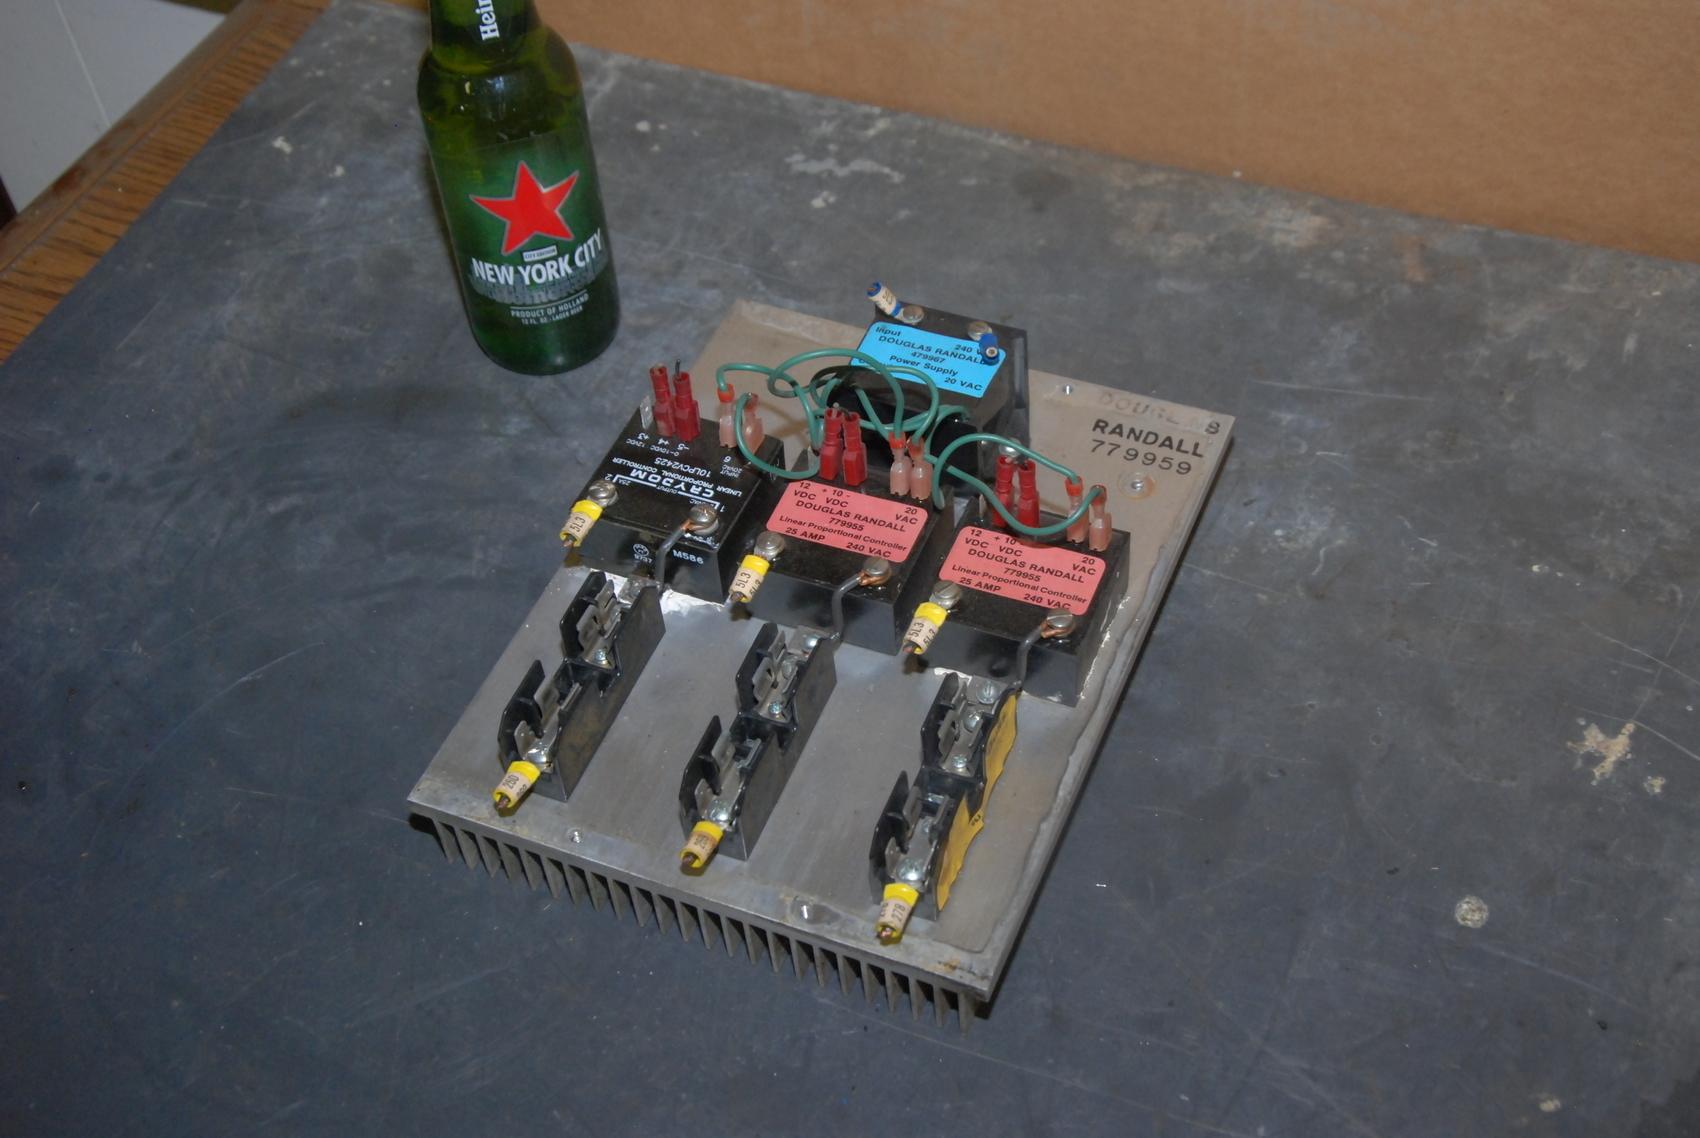 Douglas Randall 779955/Crydom 10LPCV24 Linear Proportional Controller